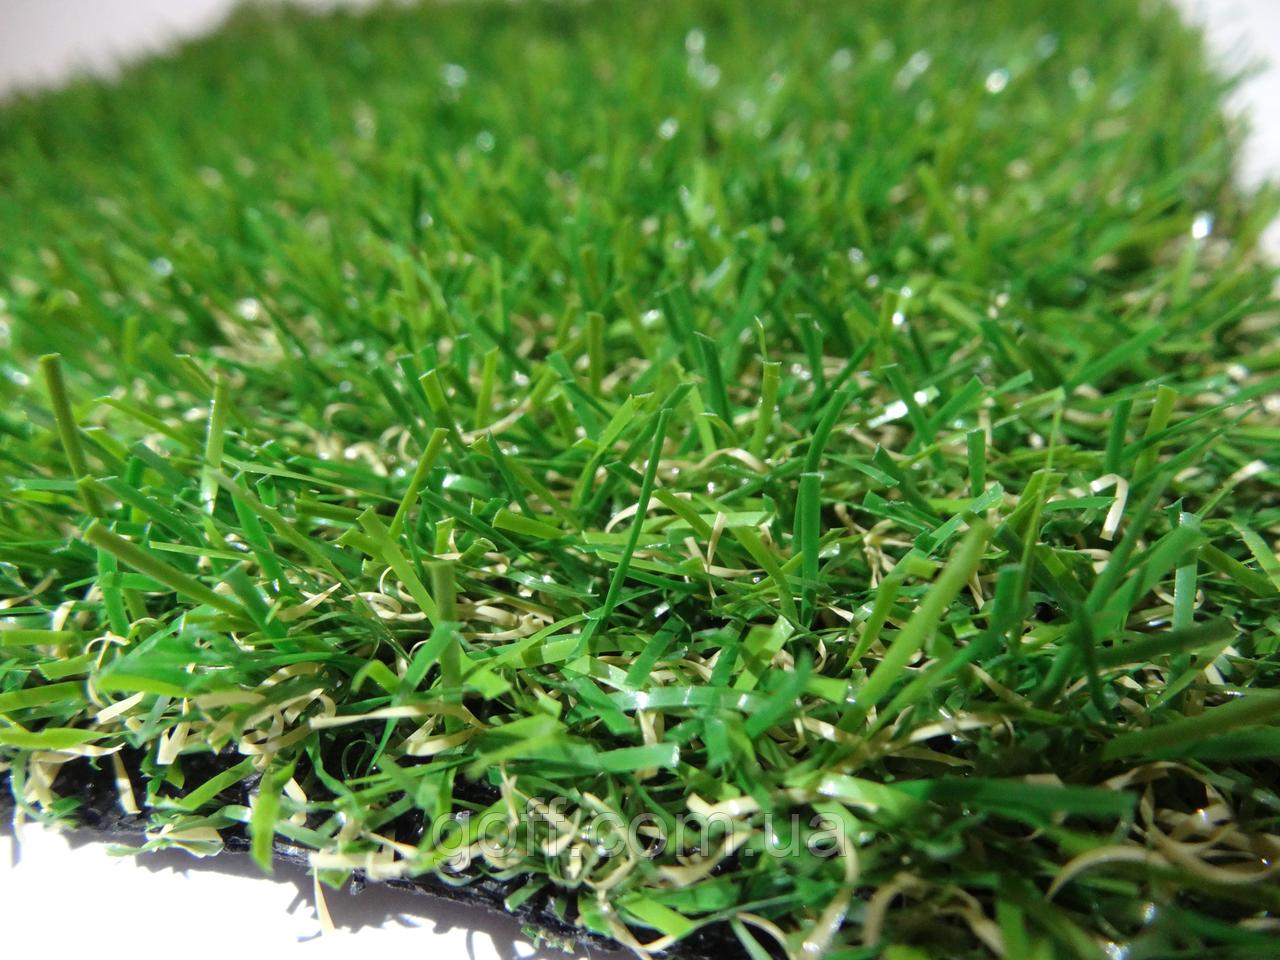 4м Декоративная трава для газона Grass DES 20мм